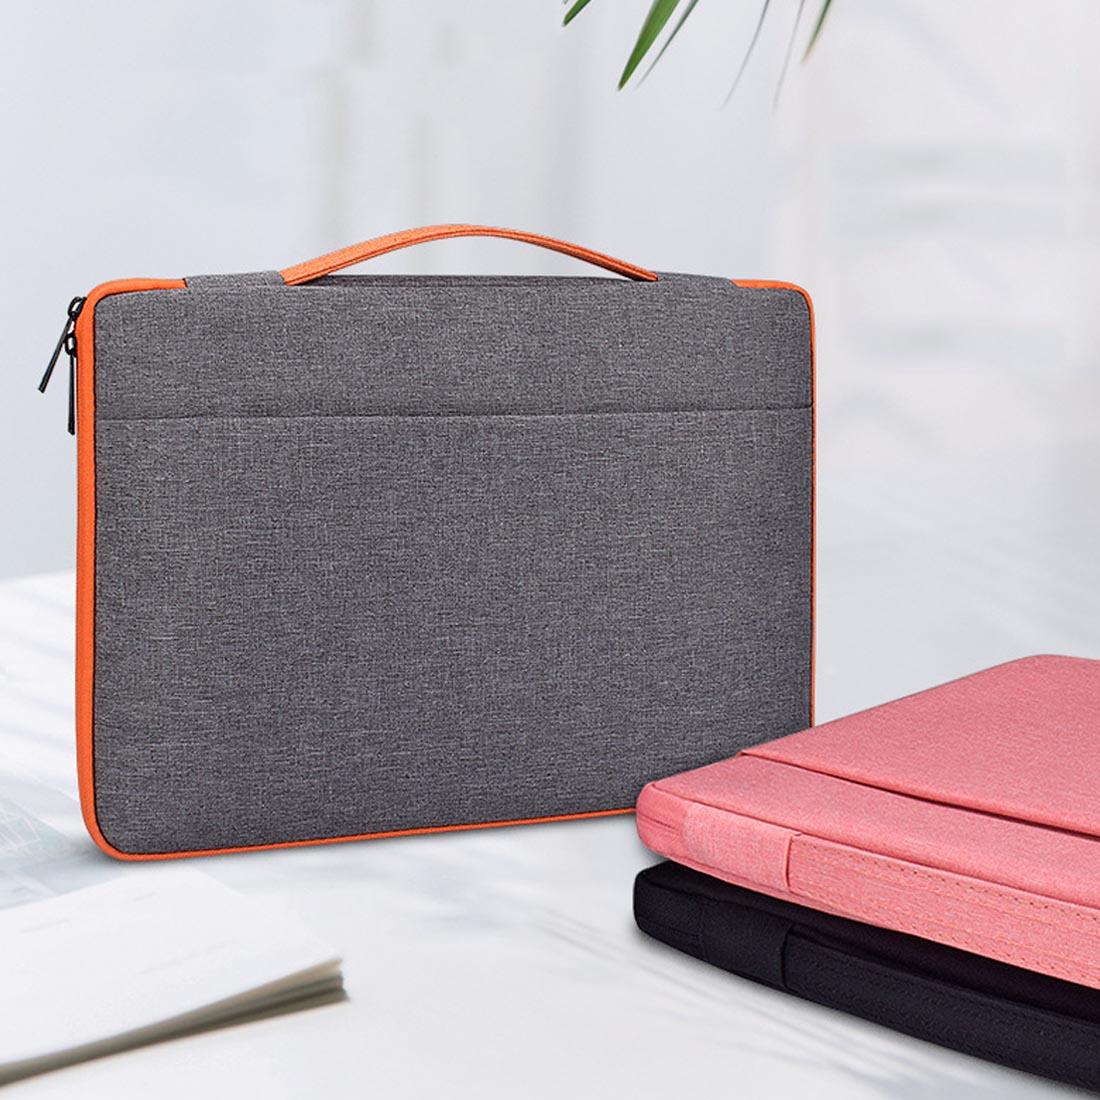 Laptop Bag Waterproof For Men Women Laptop Sleeve Case 13.3 15.6 Inch Computer Notebook Macbook Acer Lenovo Bag